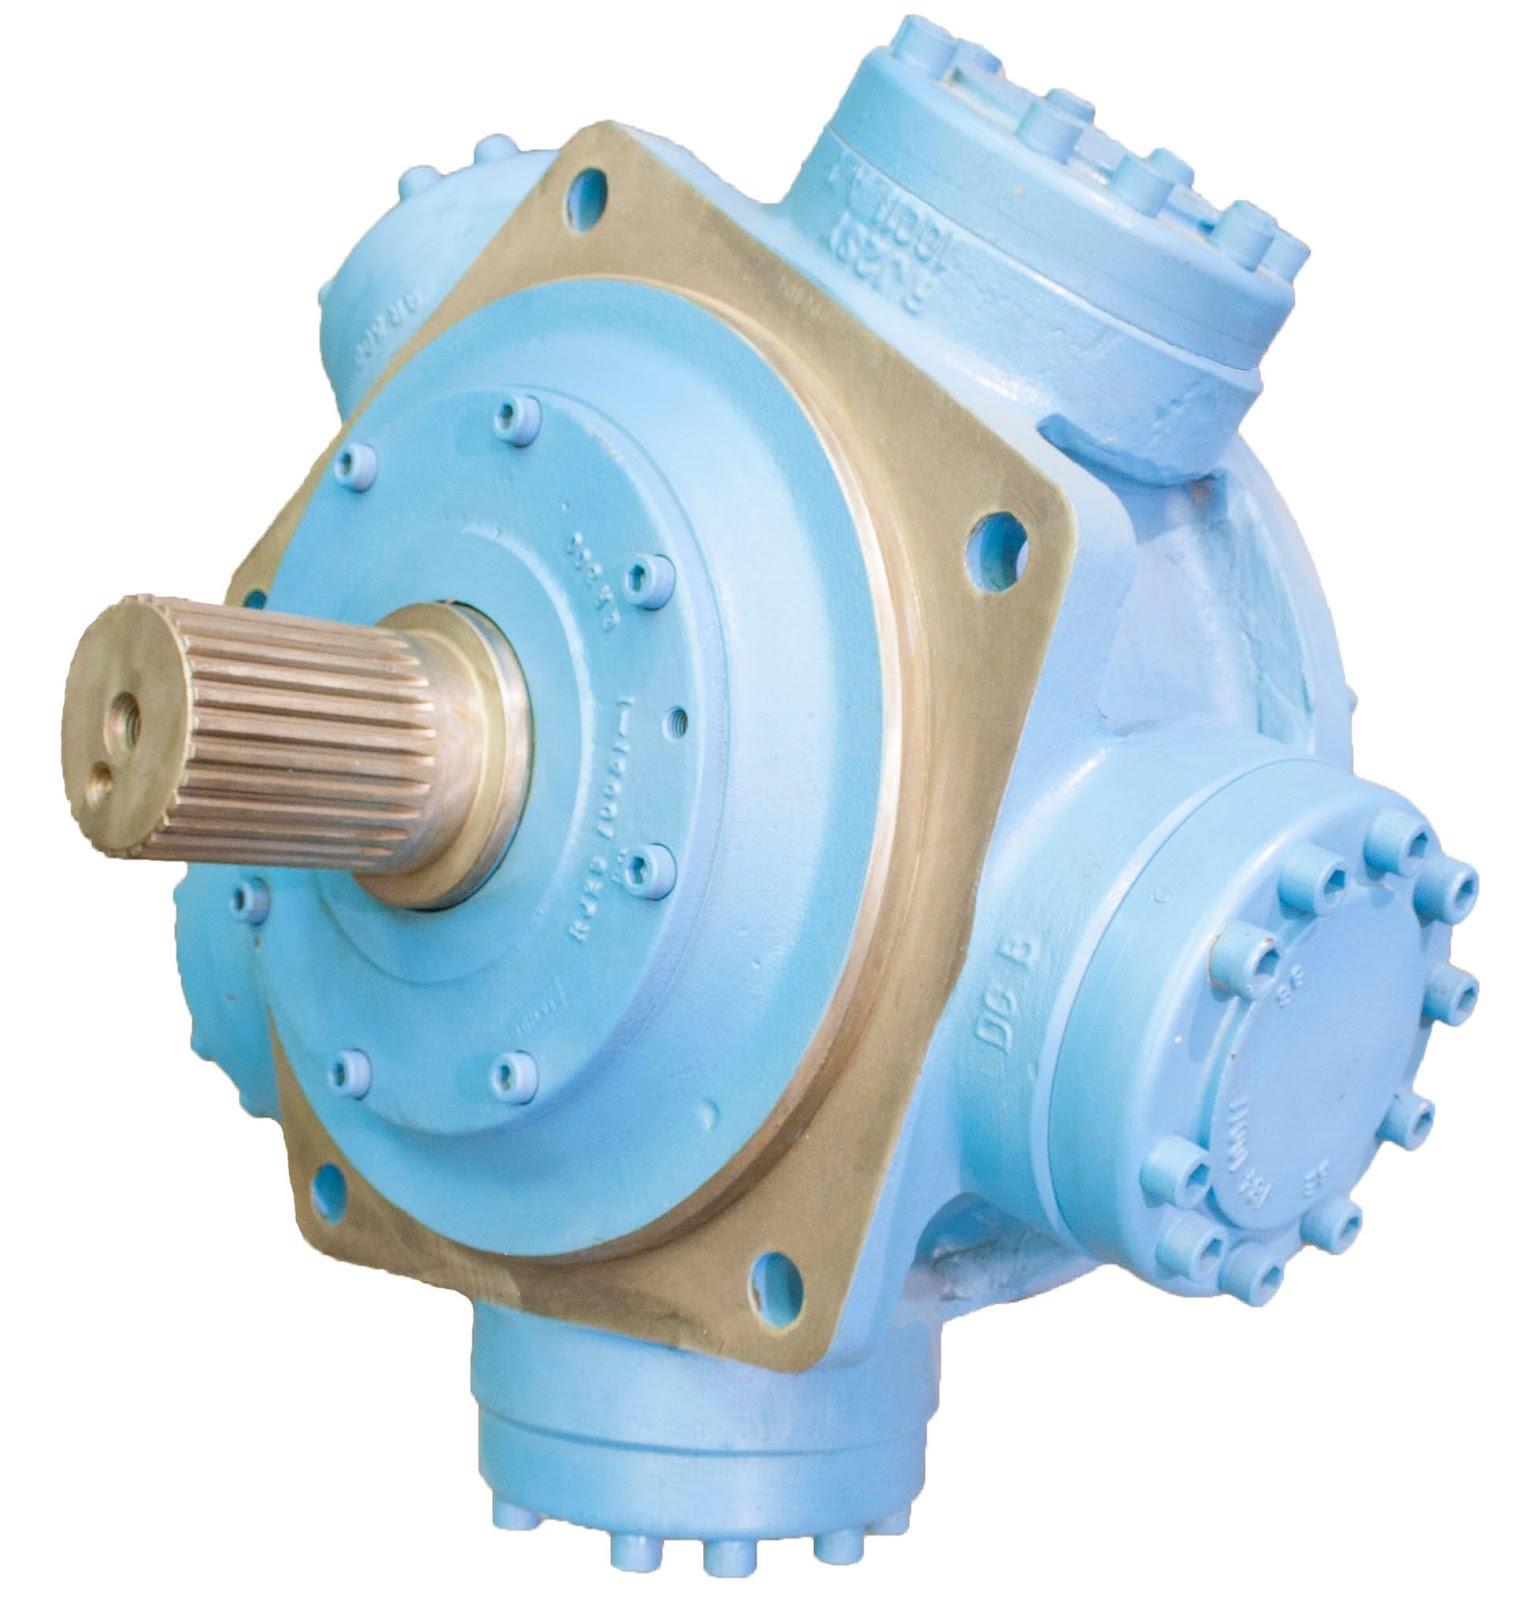 Flint Hydraulics Inc Radial Piston Motor Clearance Sale